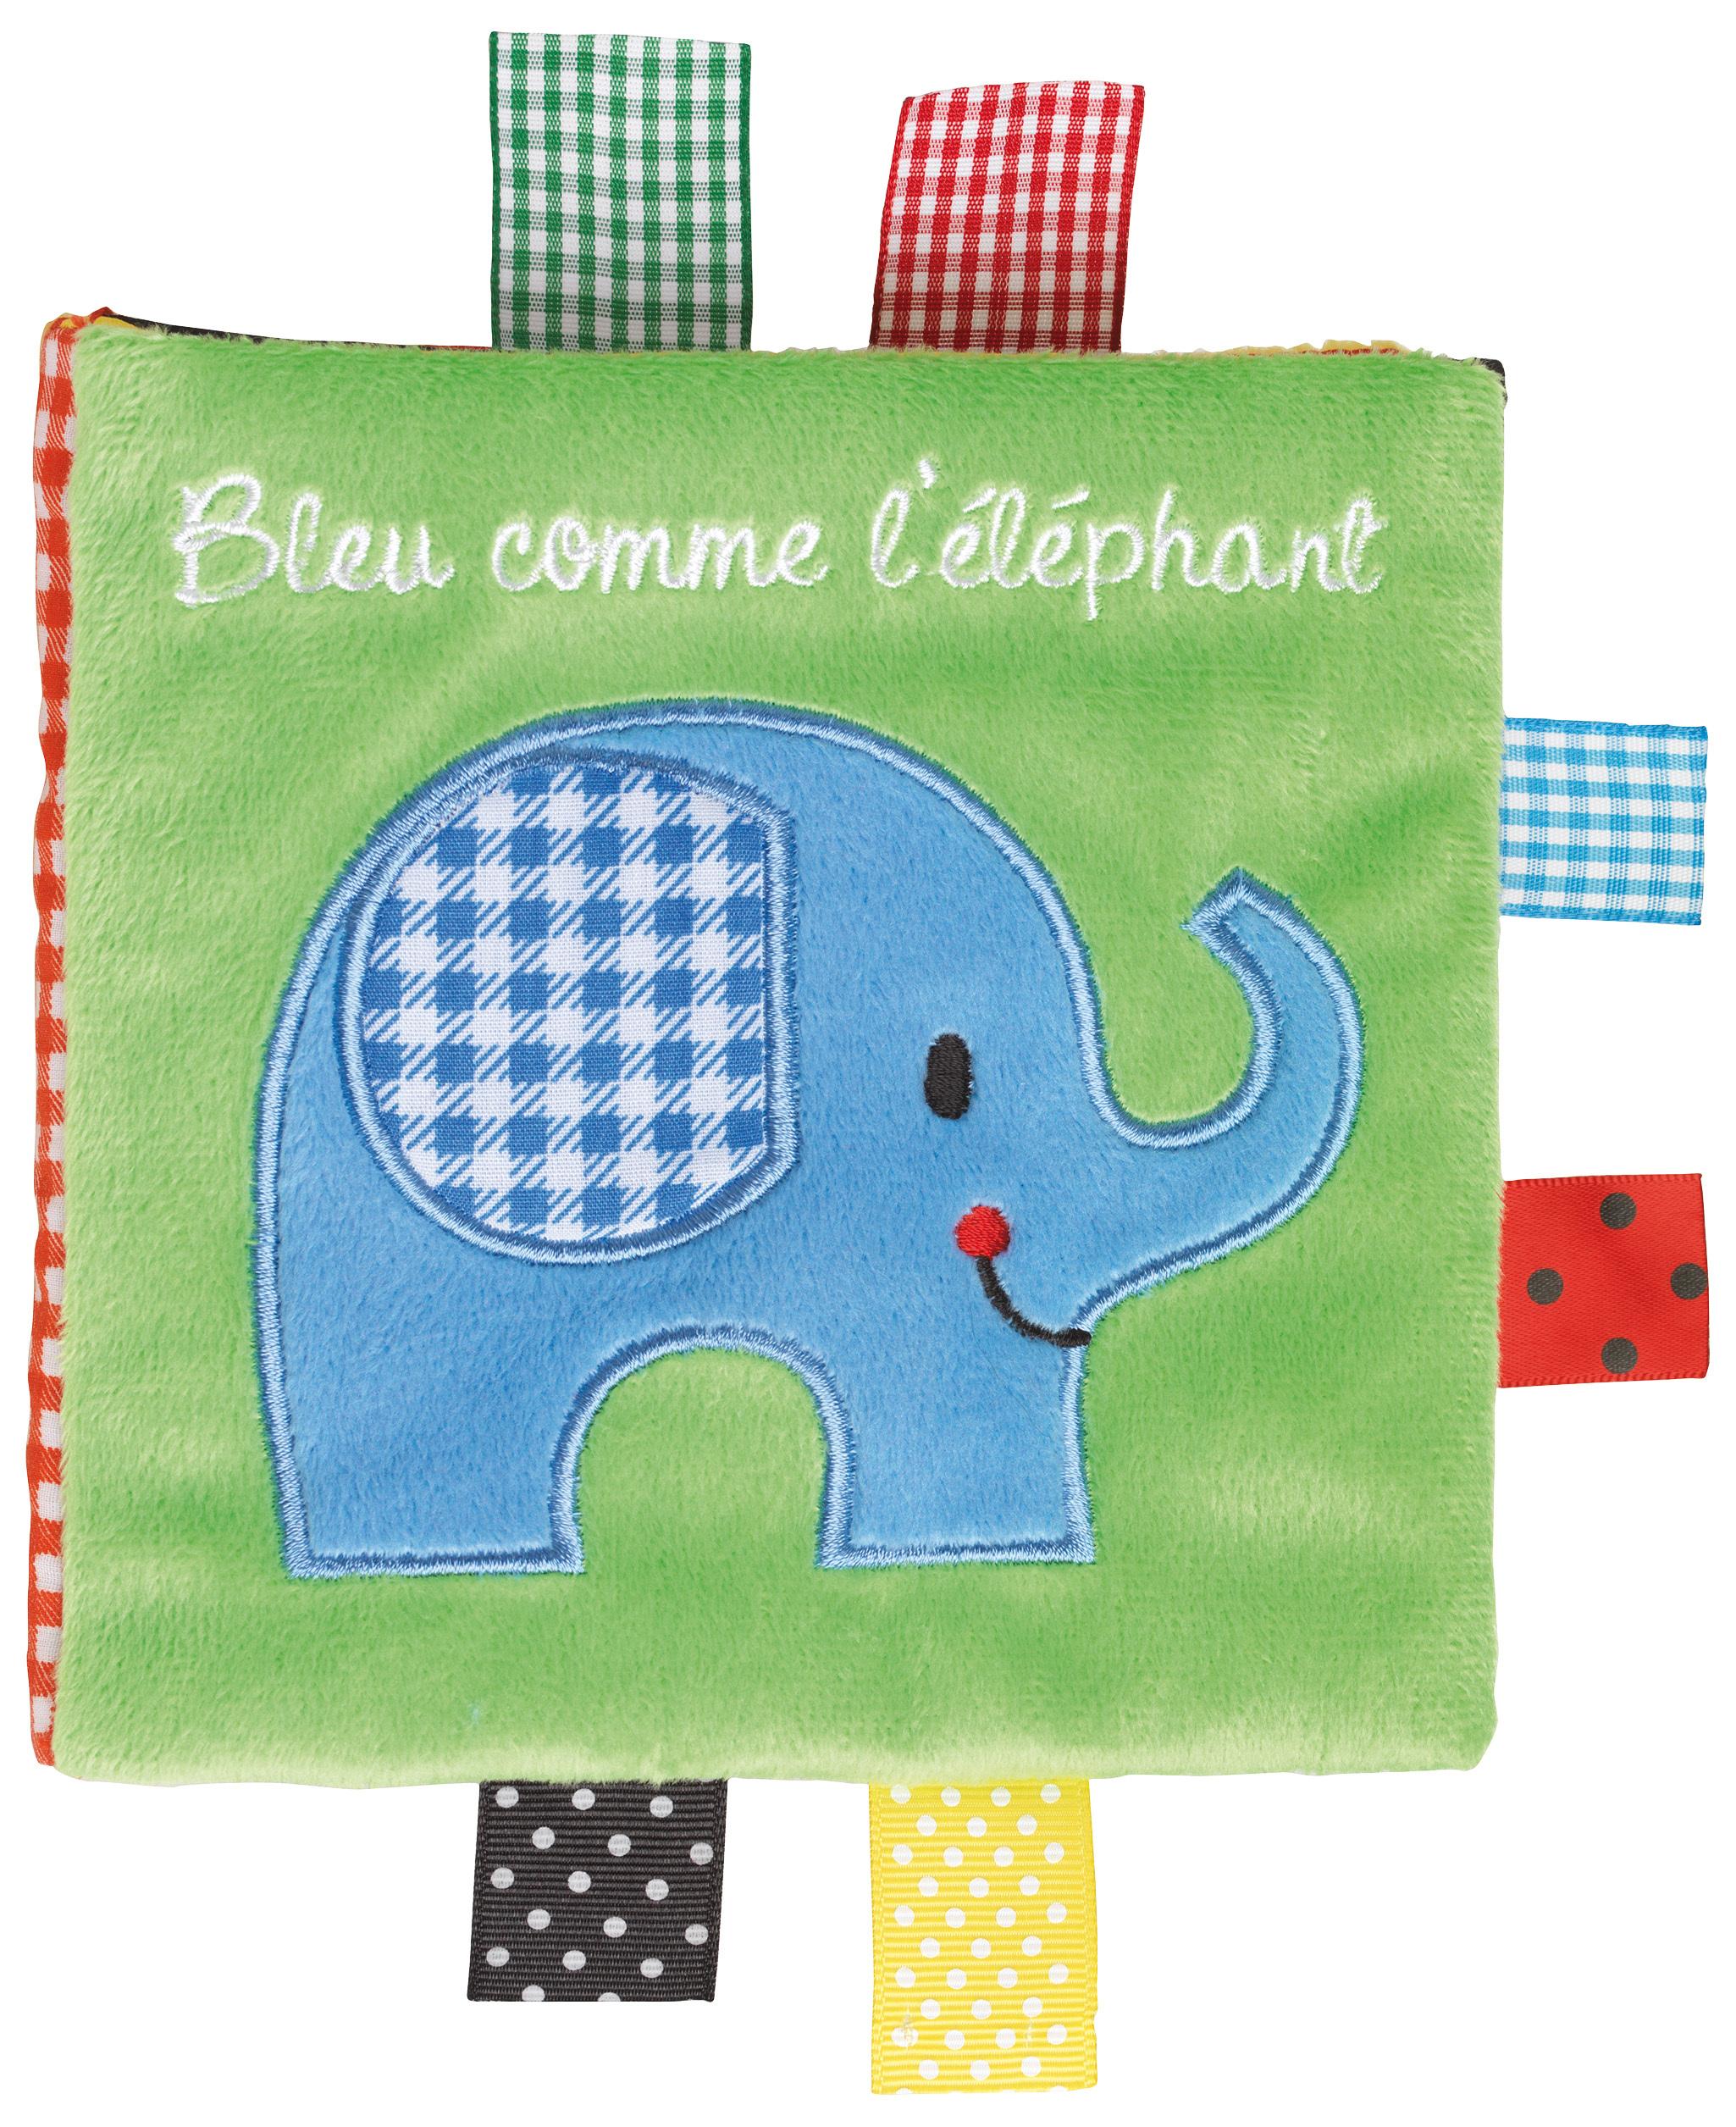 BLEU COMME L'ELEPHANT